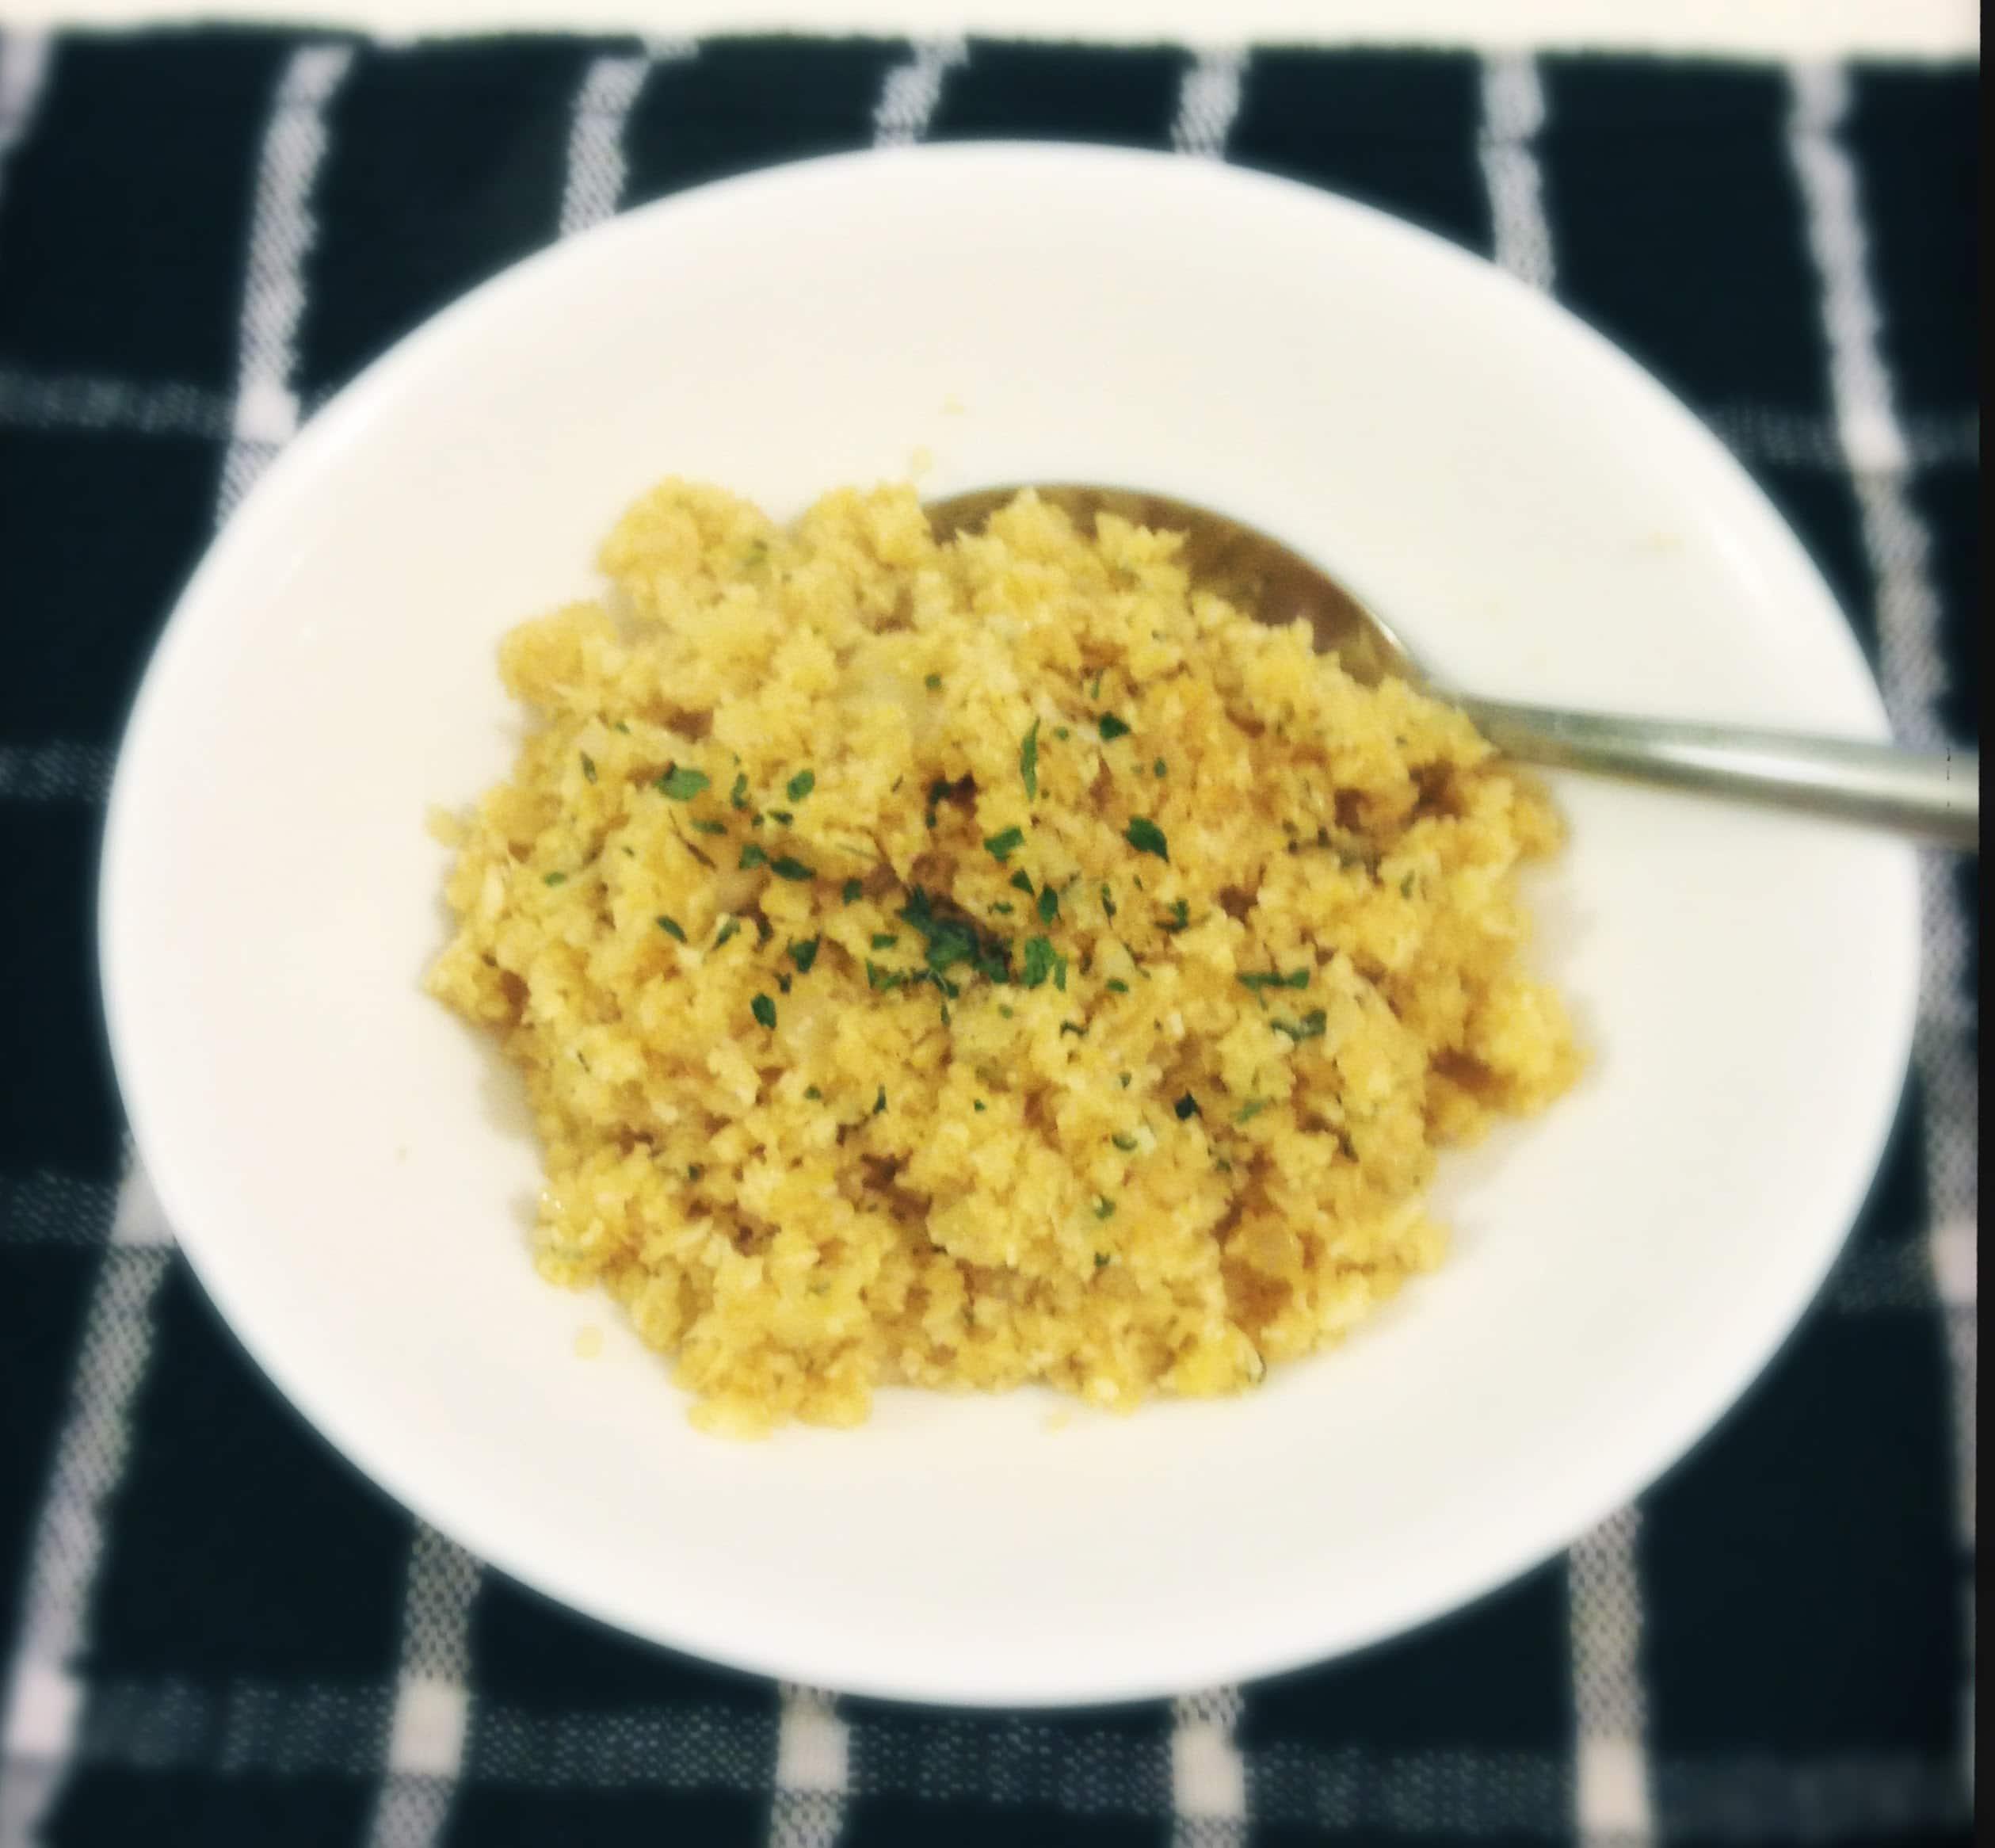 how to make cauli rice without a food processor